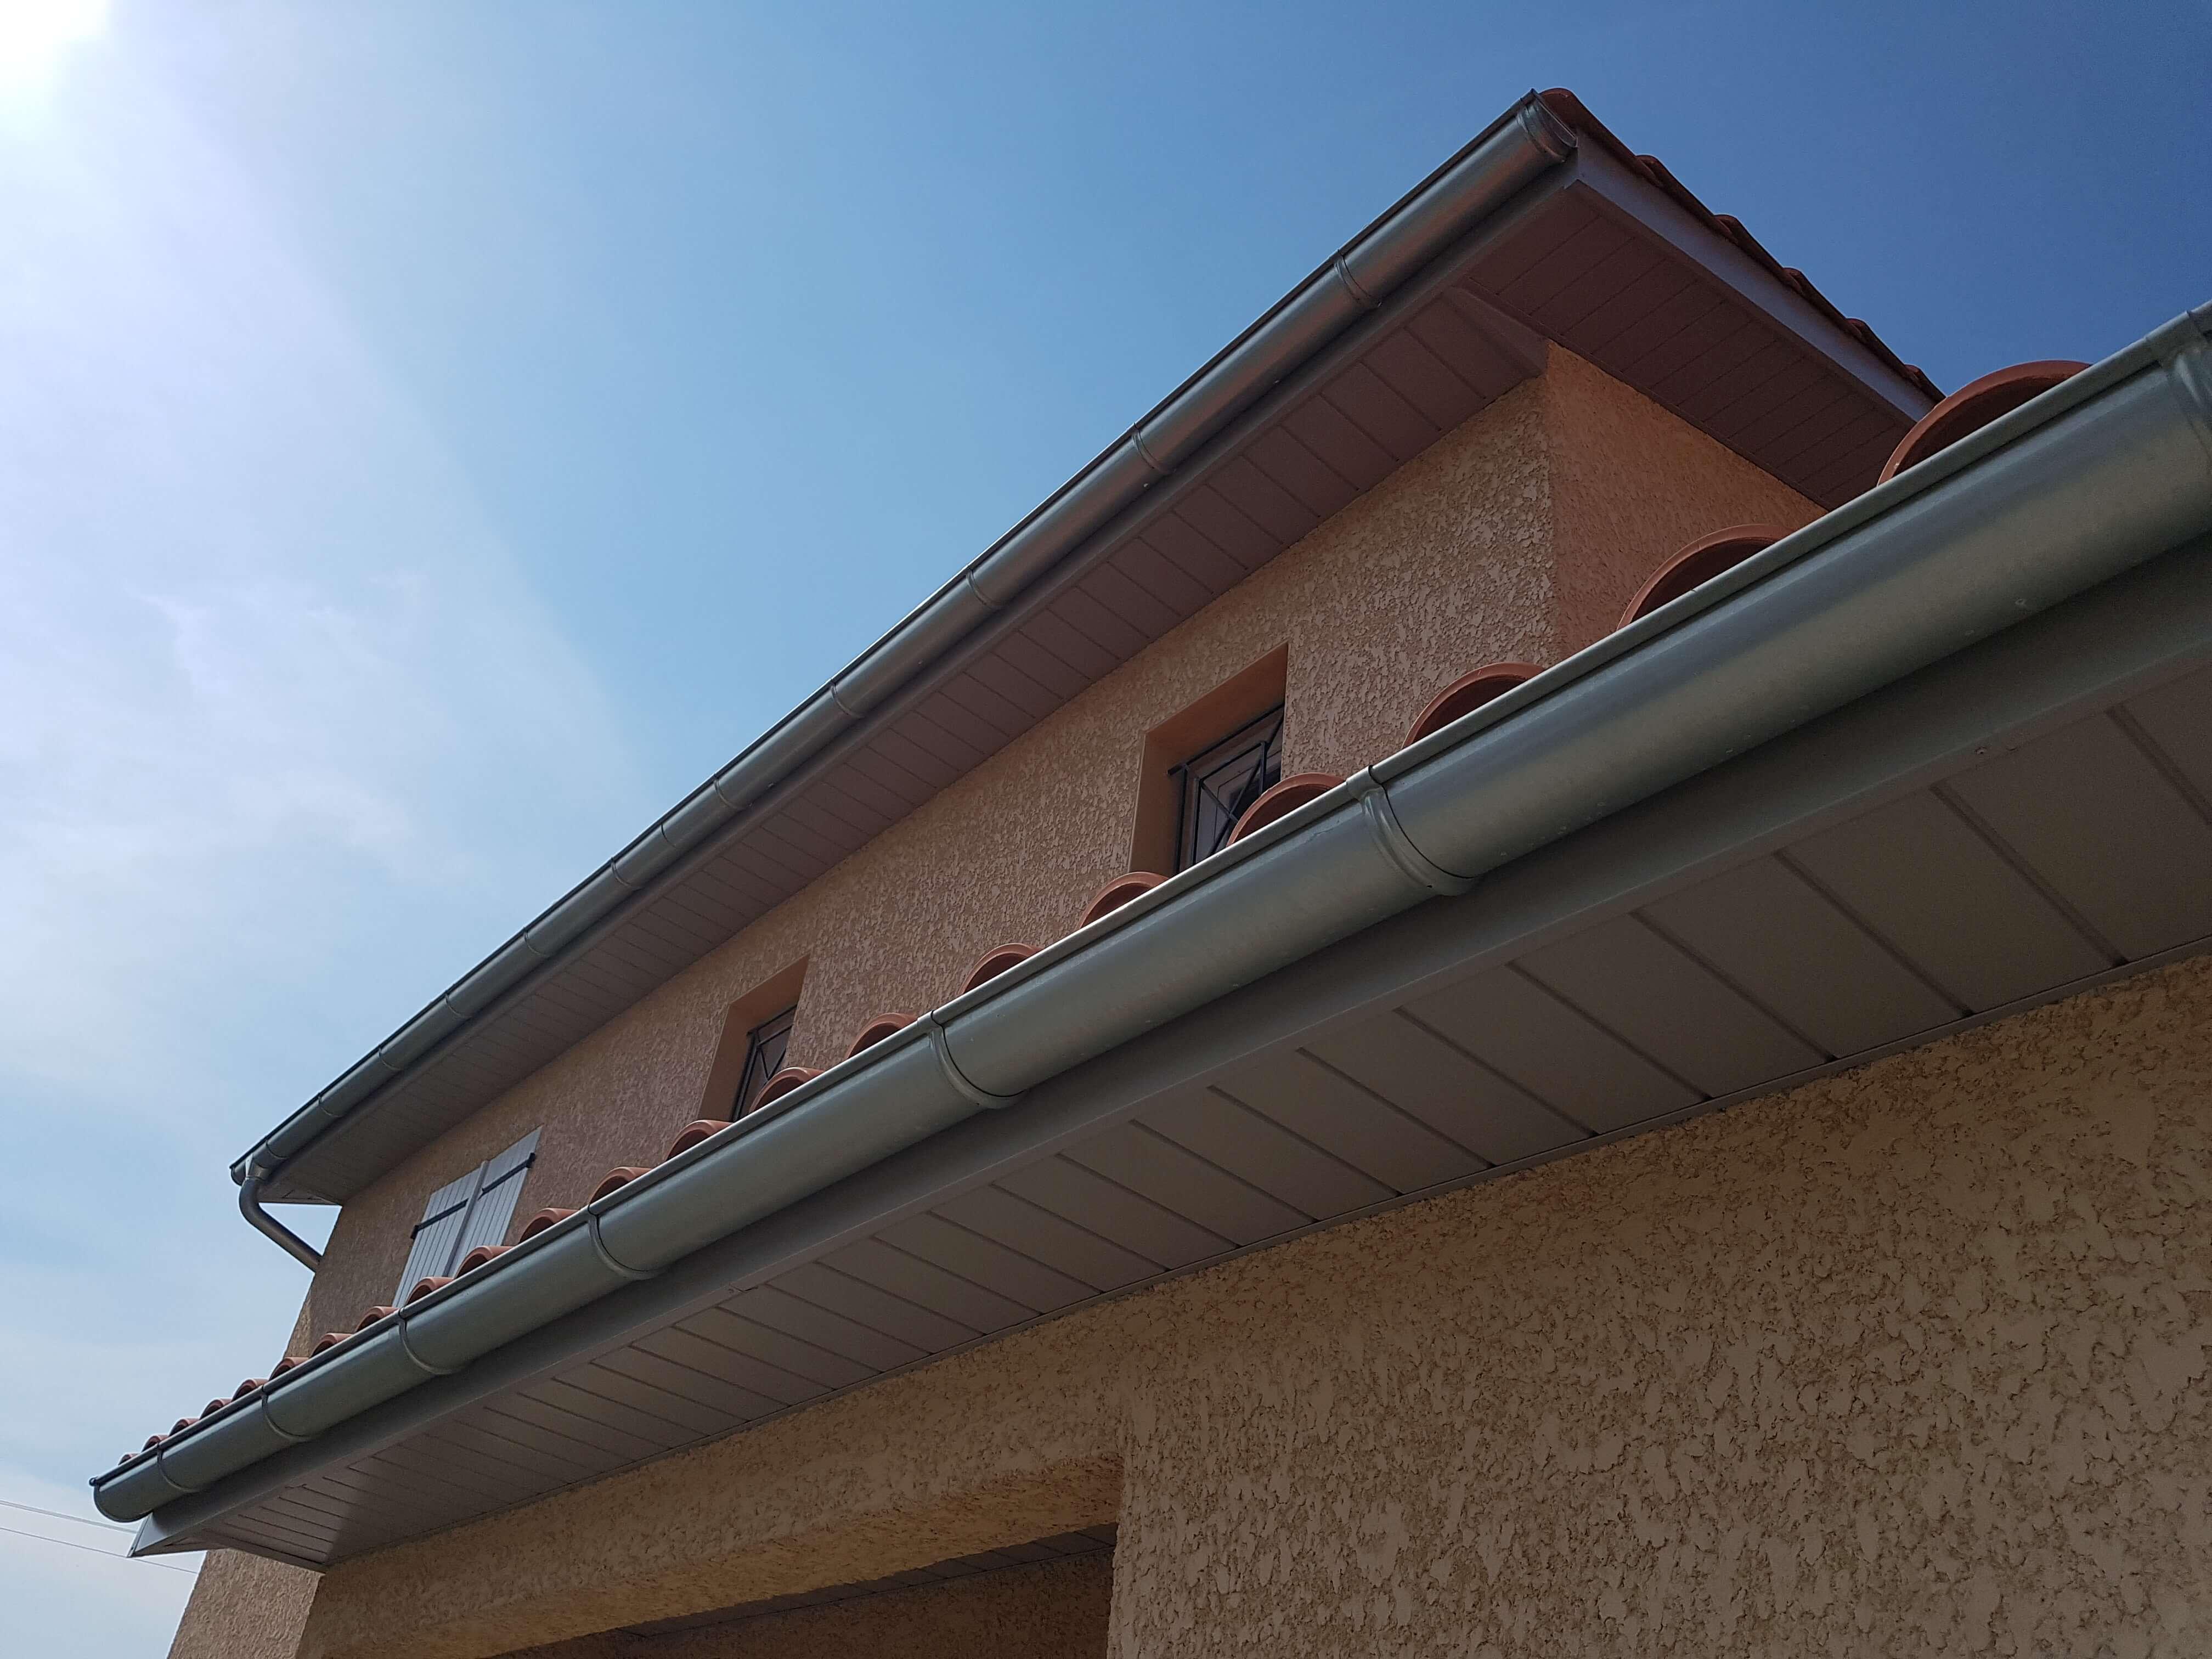 renovation toiture lyon bjbat dal 39 alu contactez nous 04. Black Bedroom Furniture Sets. Home Design Ideas